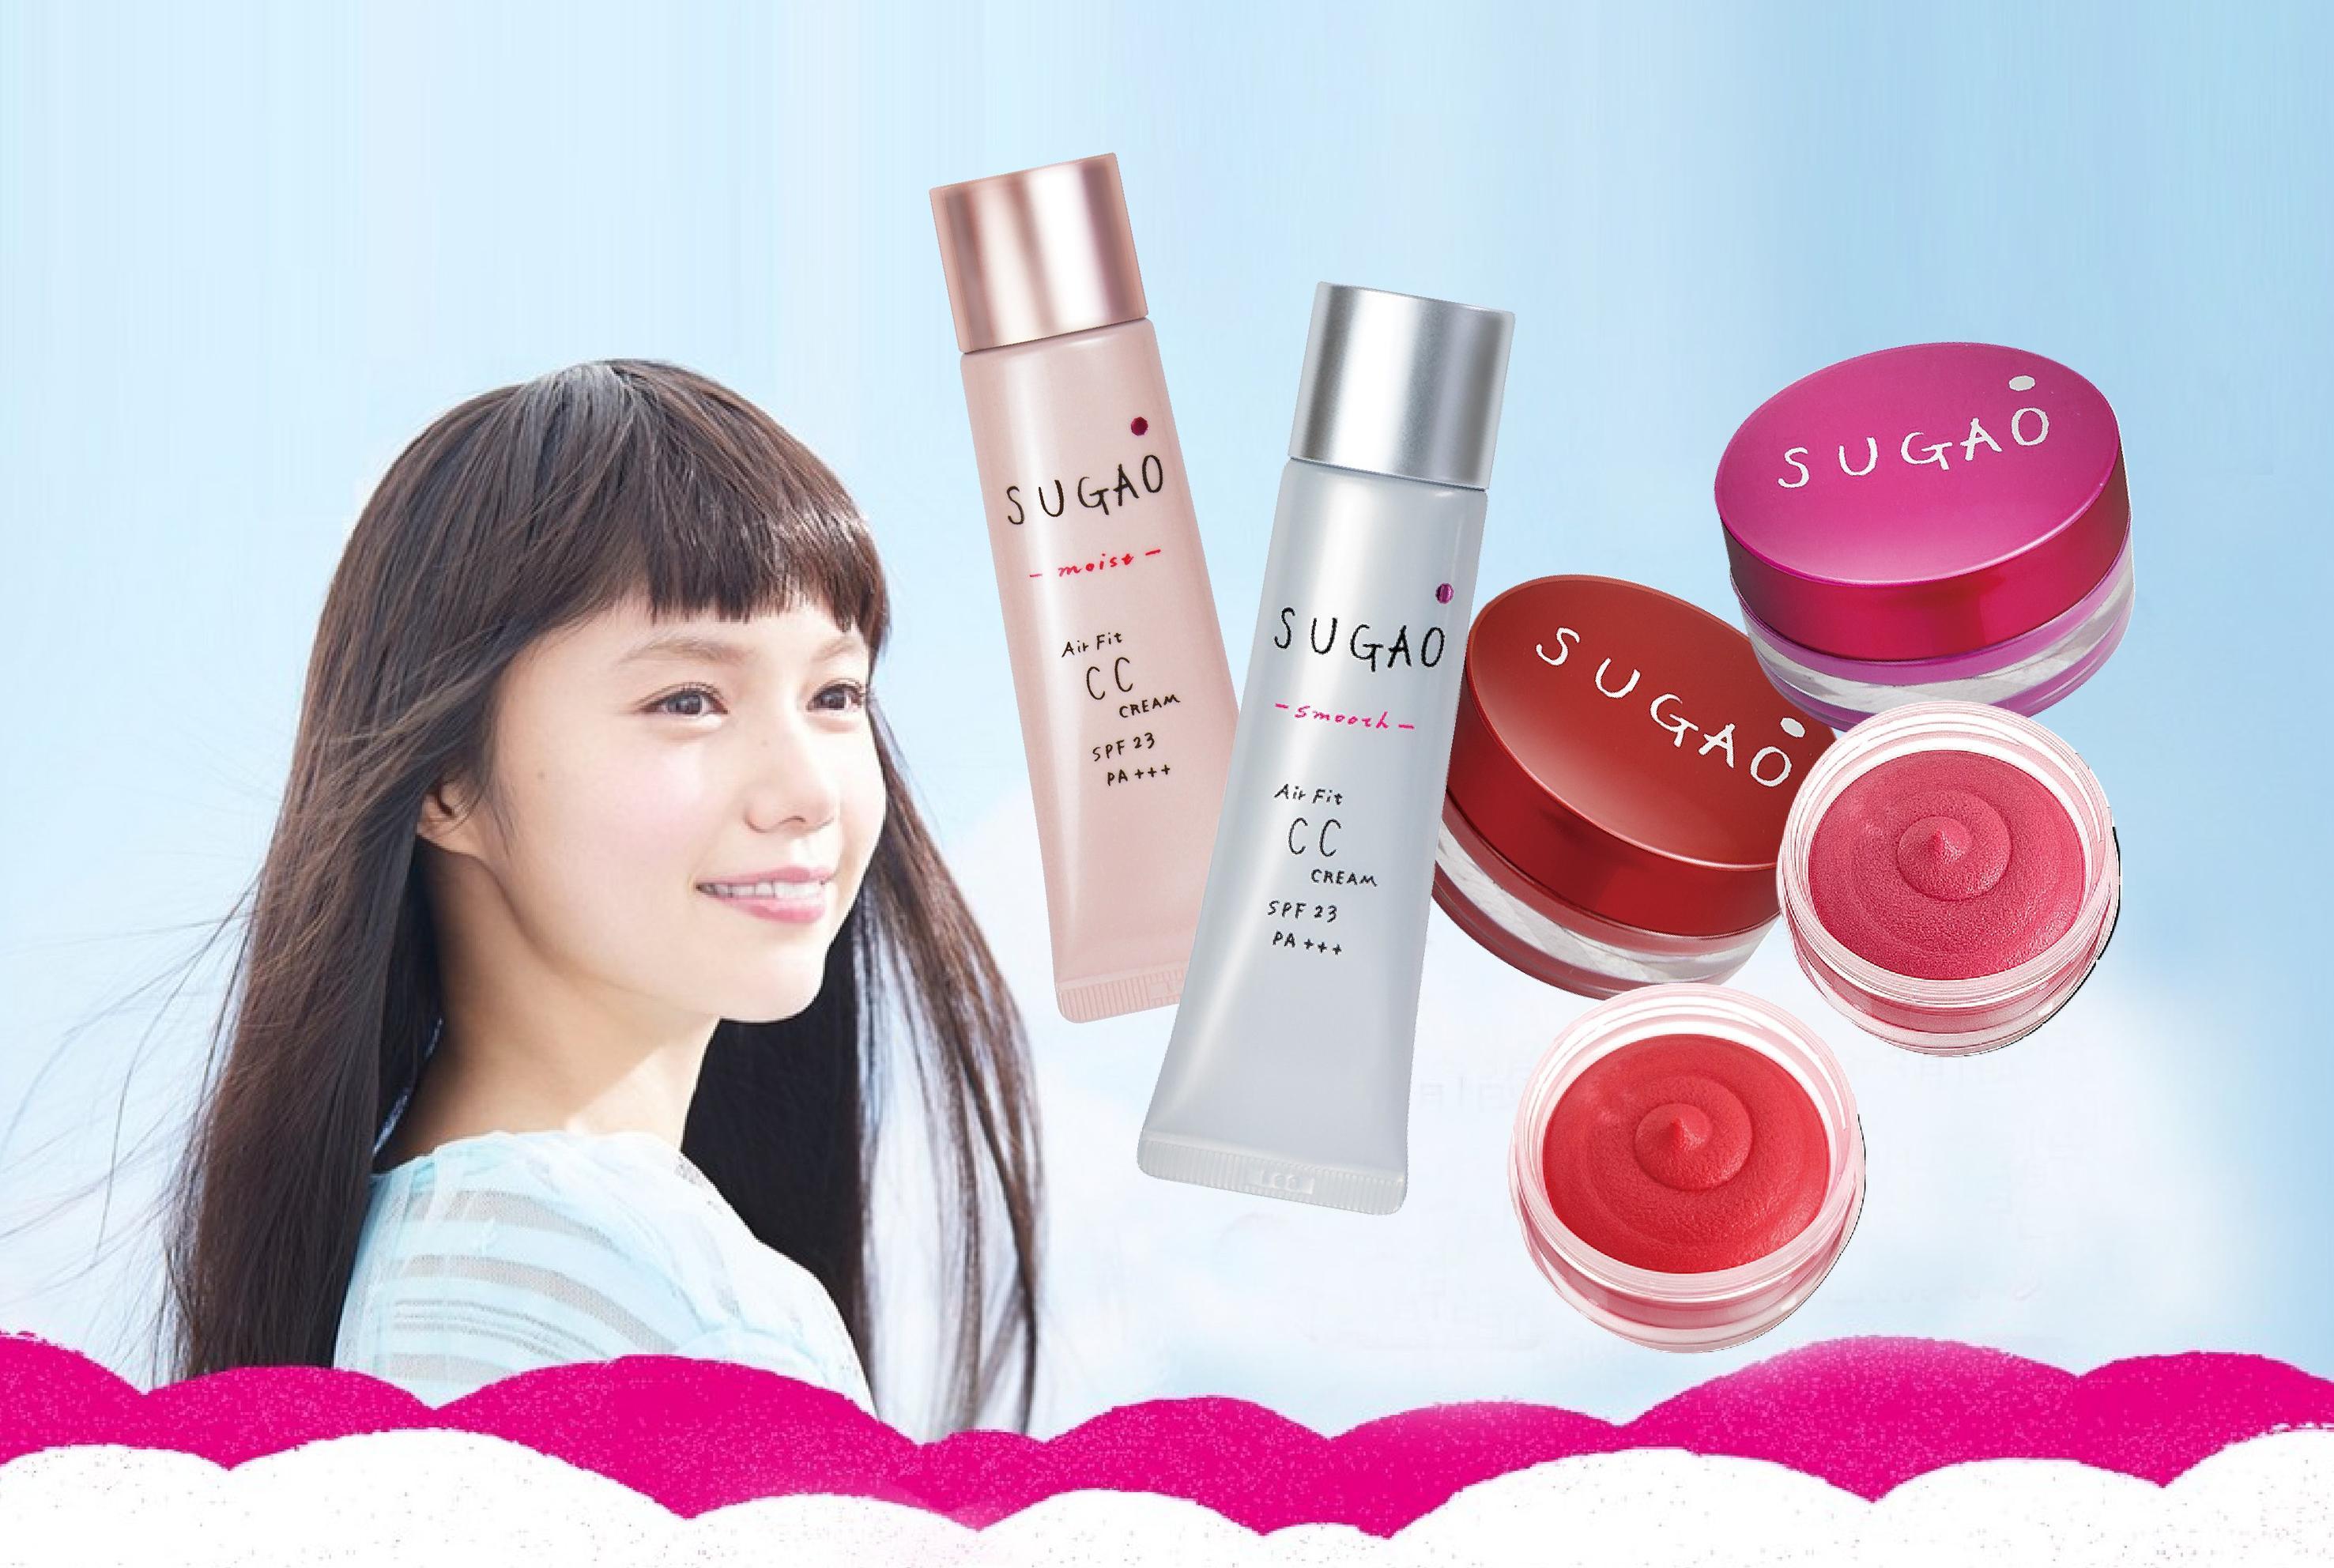 sugao-cc-creamcheek-lip-group